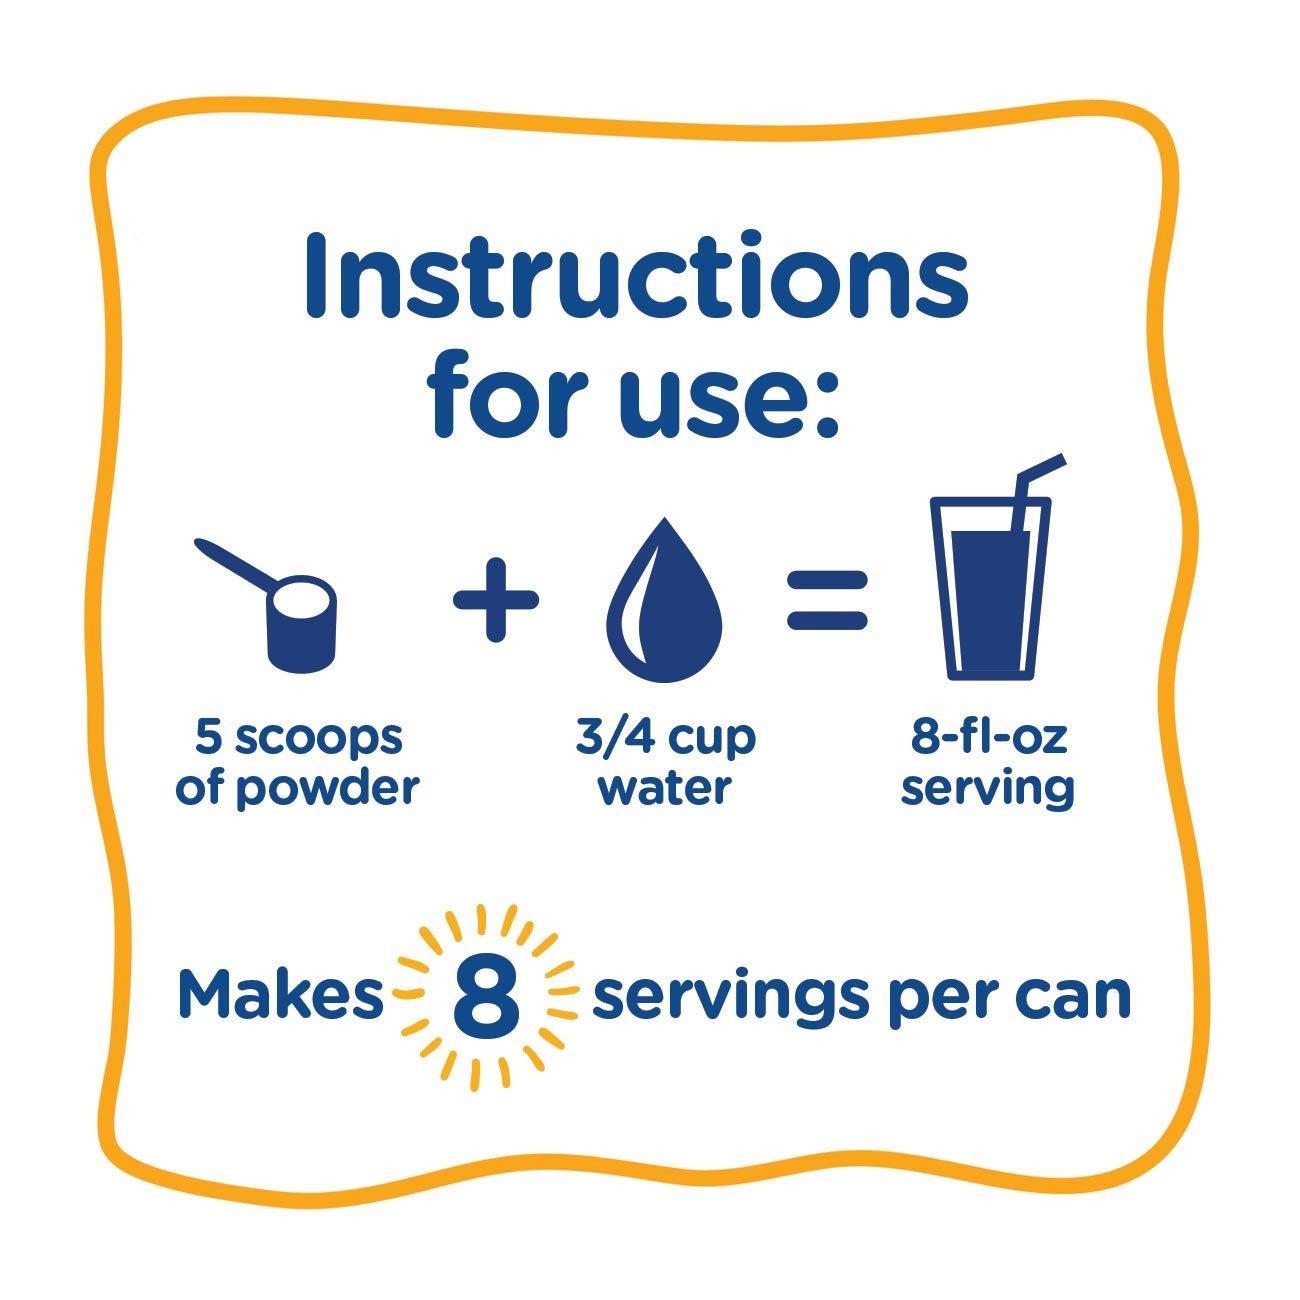 PediaSure Grow & Gain Non-GMO Vanilla Shake Mix Powder, Nutrition Shake for Kids, 14.1 oz, 3 Count by Pediasure (Image #8)